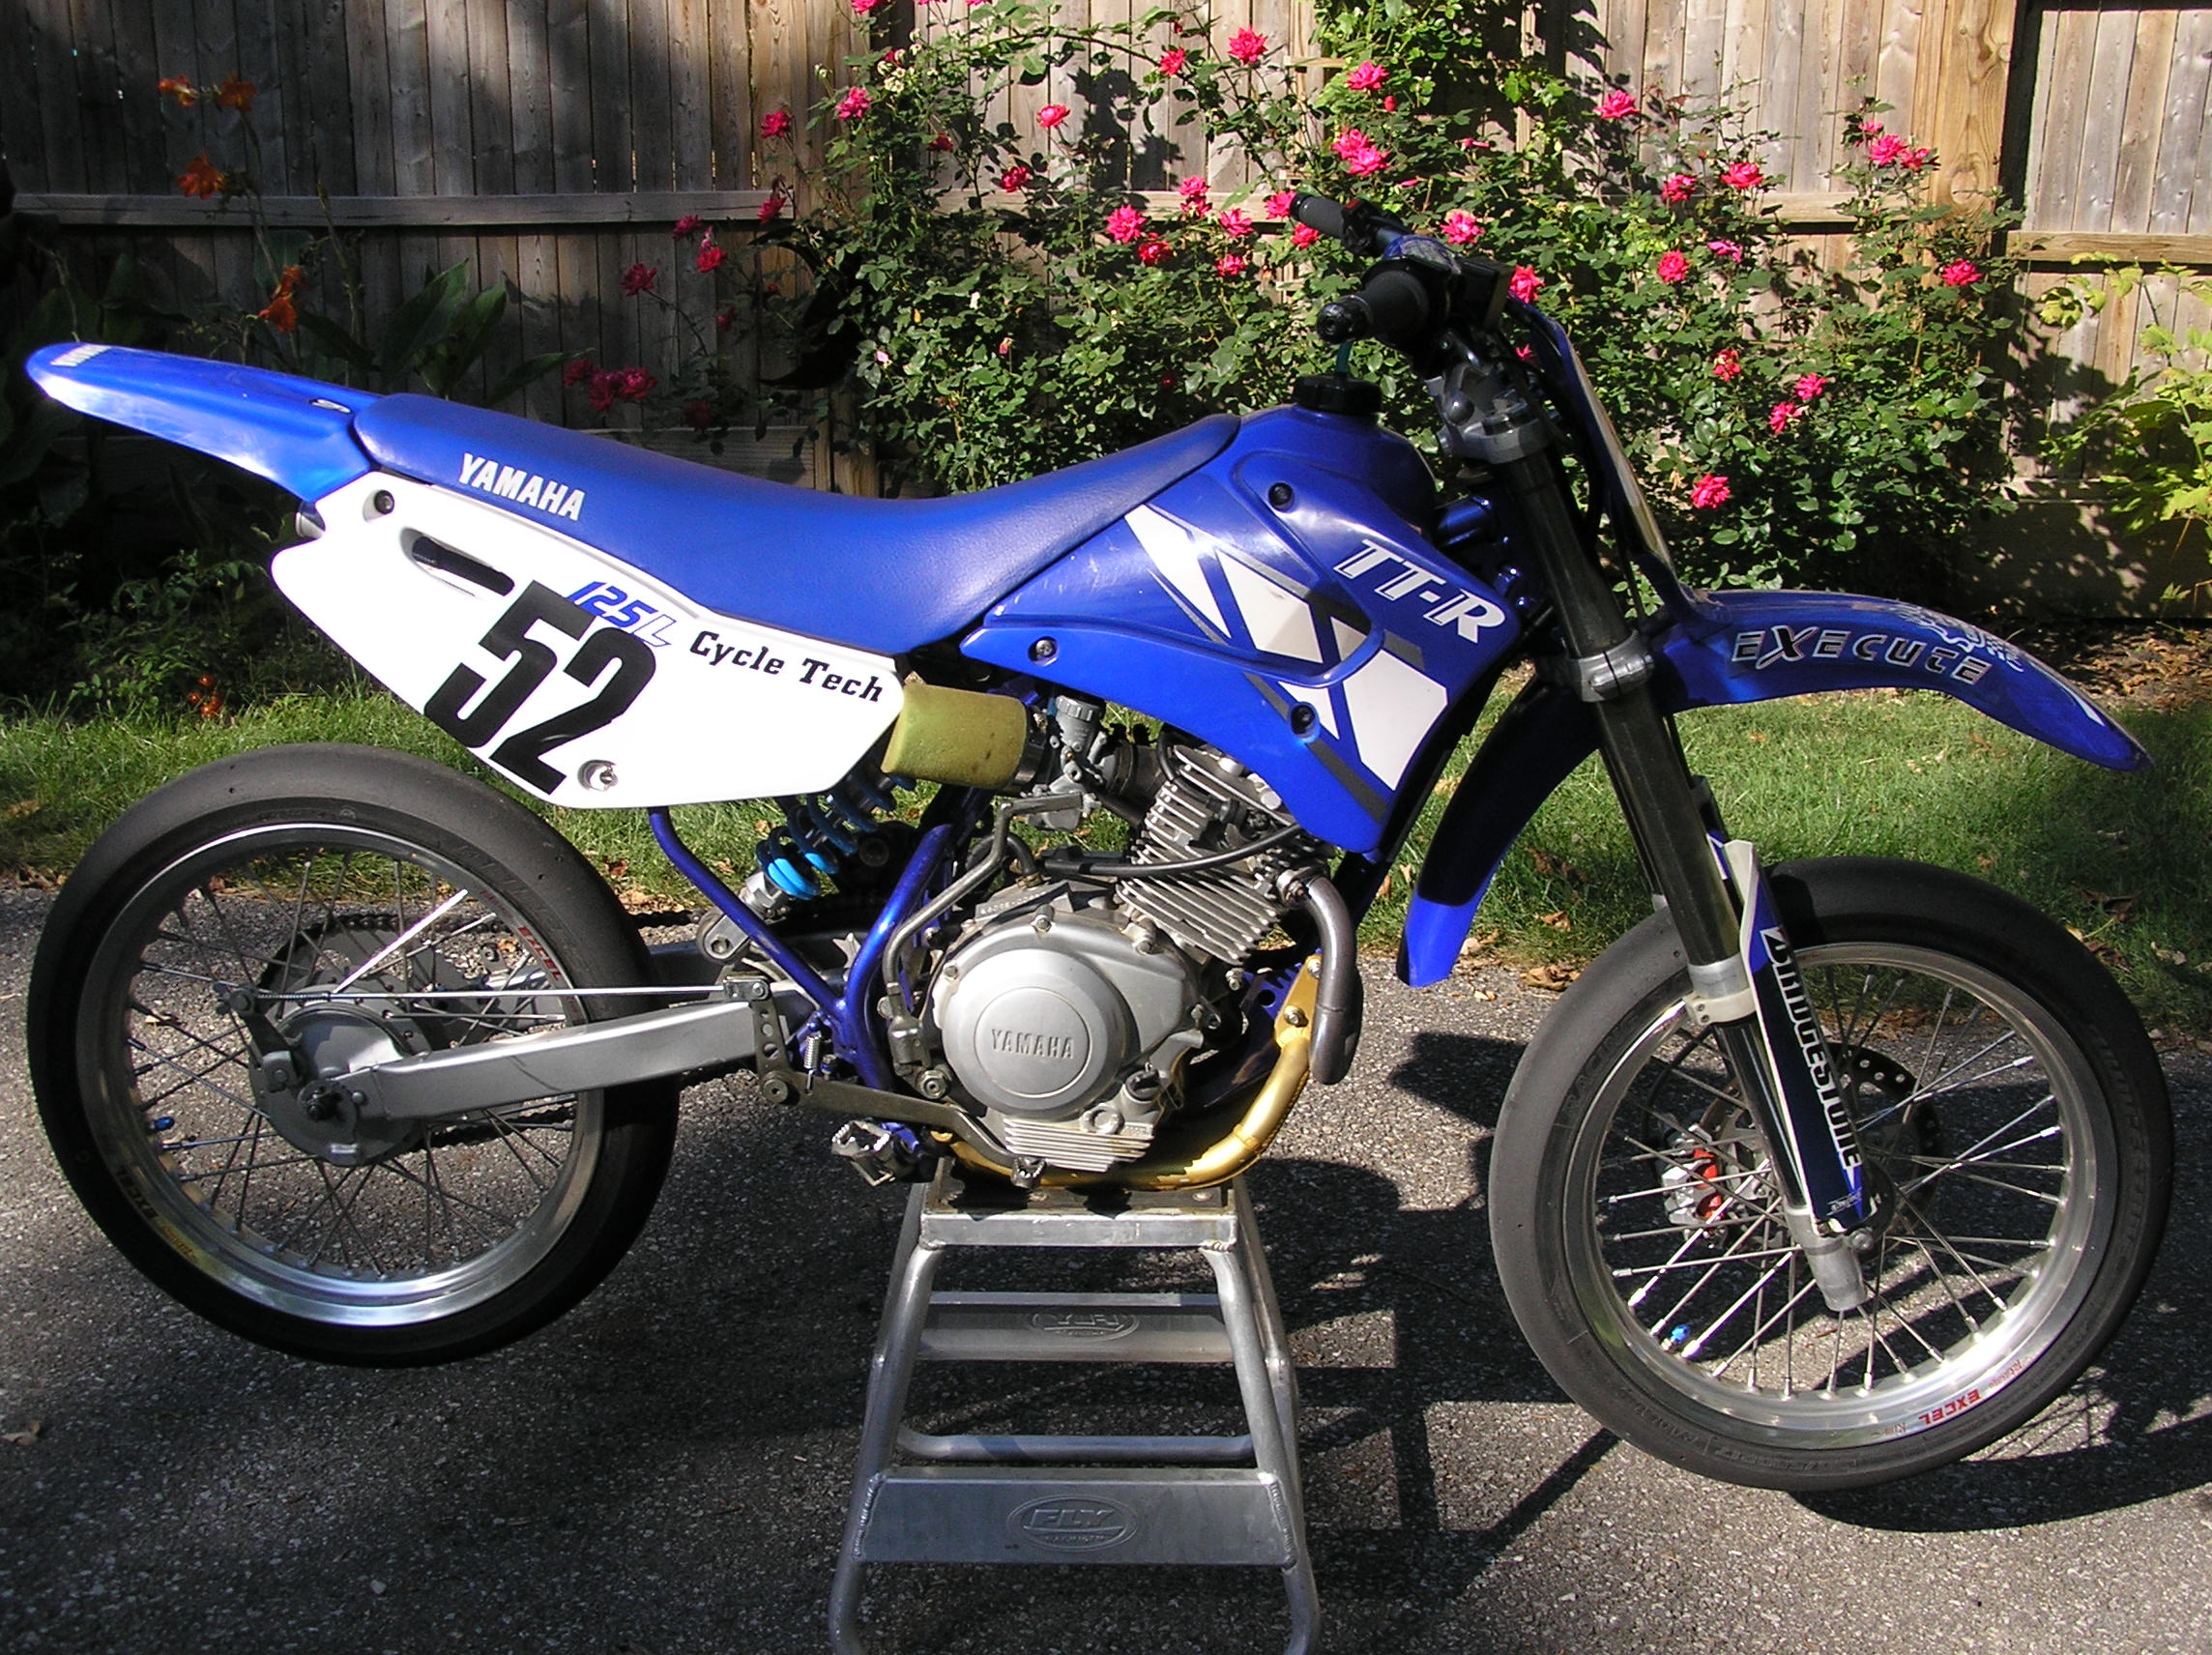 2001 Yamaha Ttr 125 Manual Shehasgoodgenes 2131397 2003 Wiring Tmx Diagram Motor Diagrams